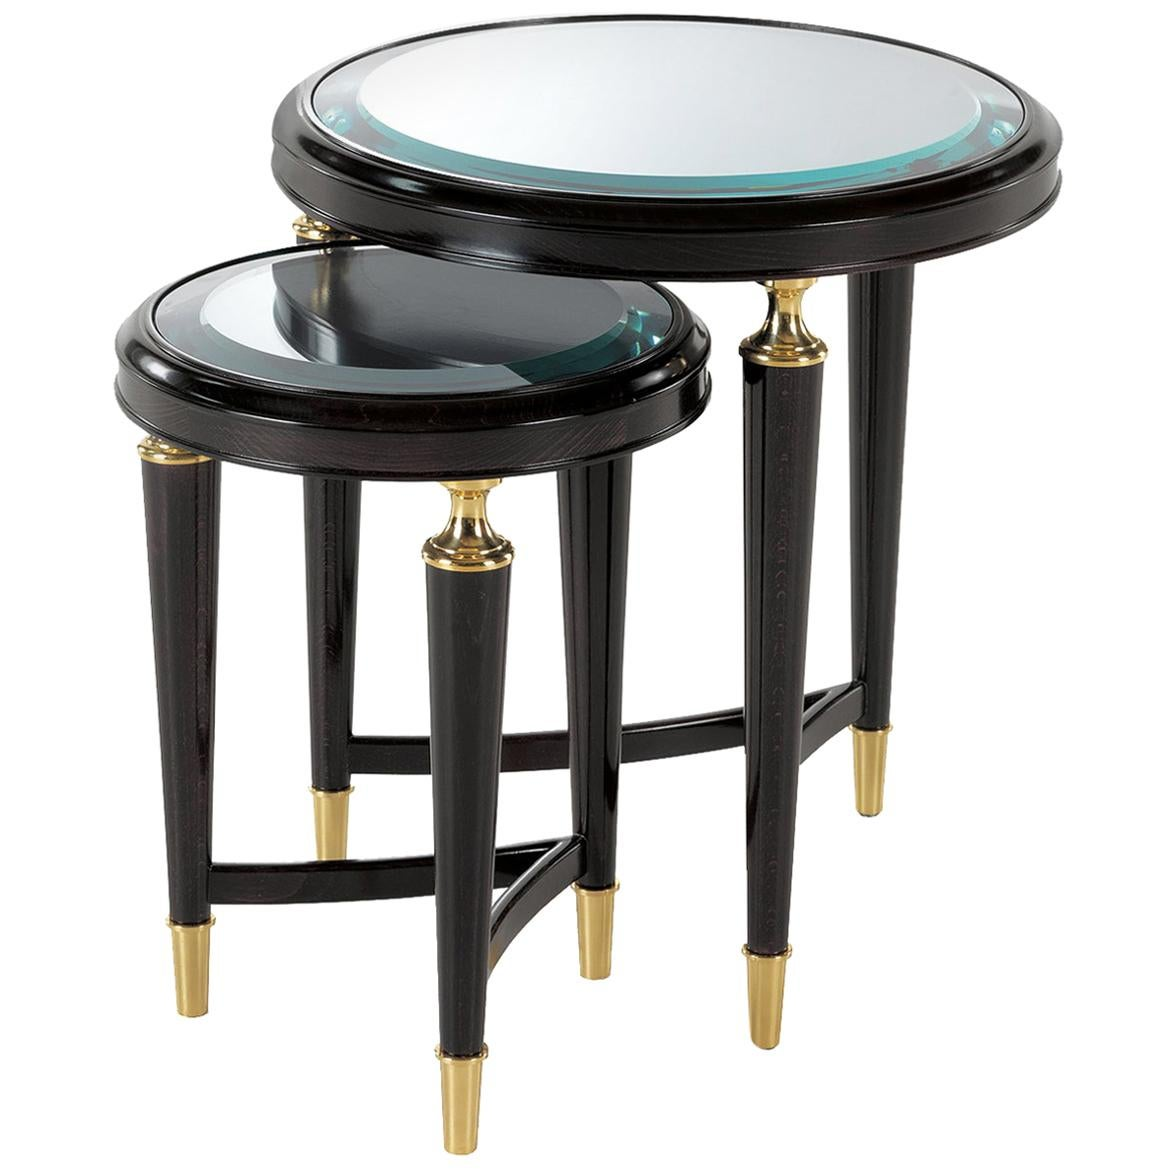 Set of 2 Nesting Side Tables